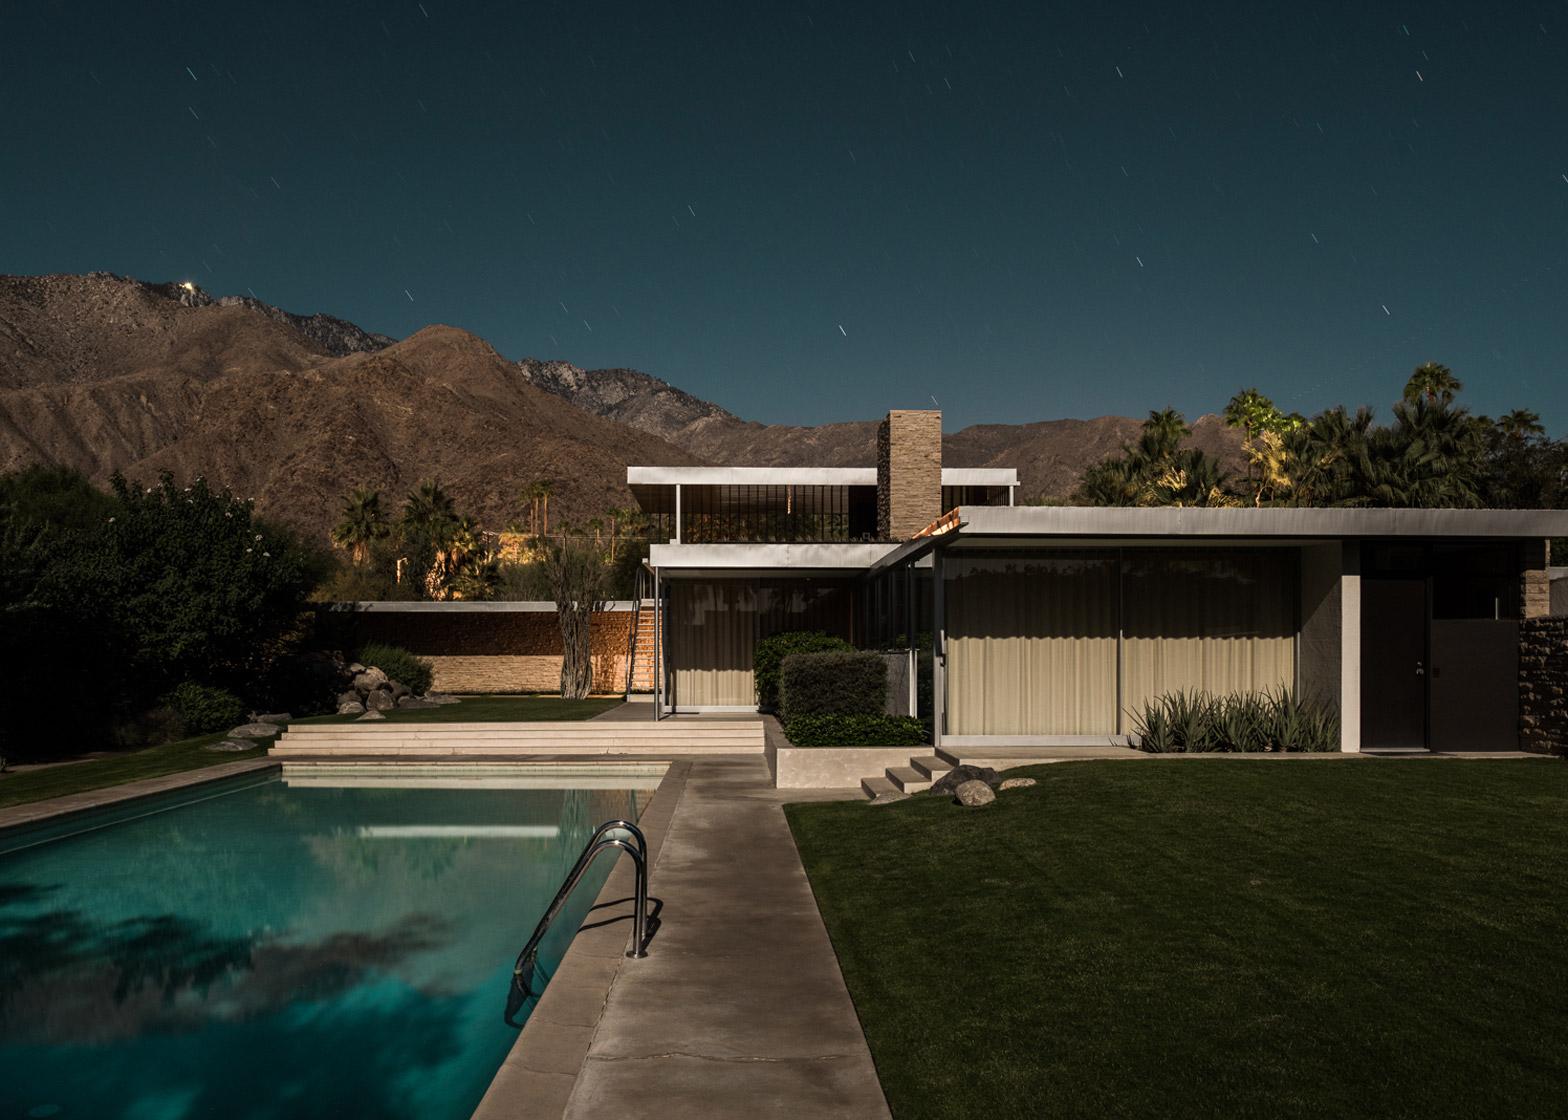 Midnight Modernism by Tom Blachford